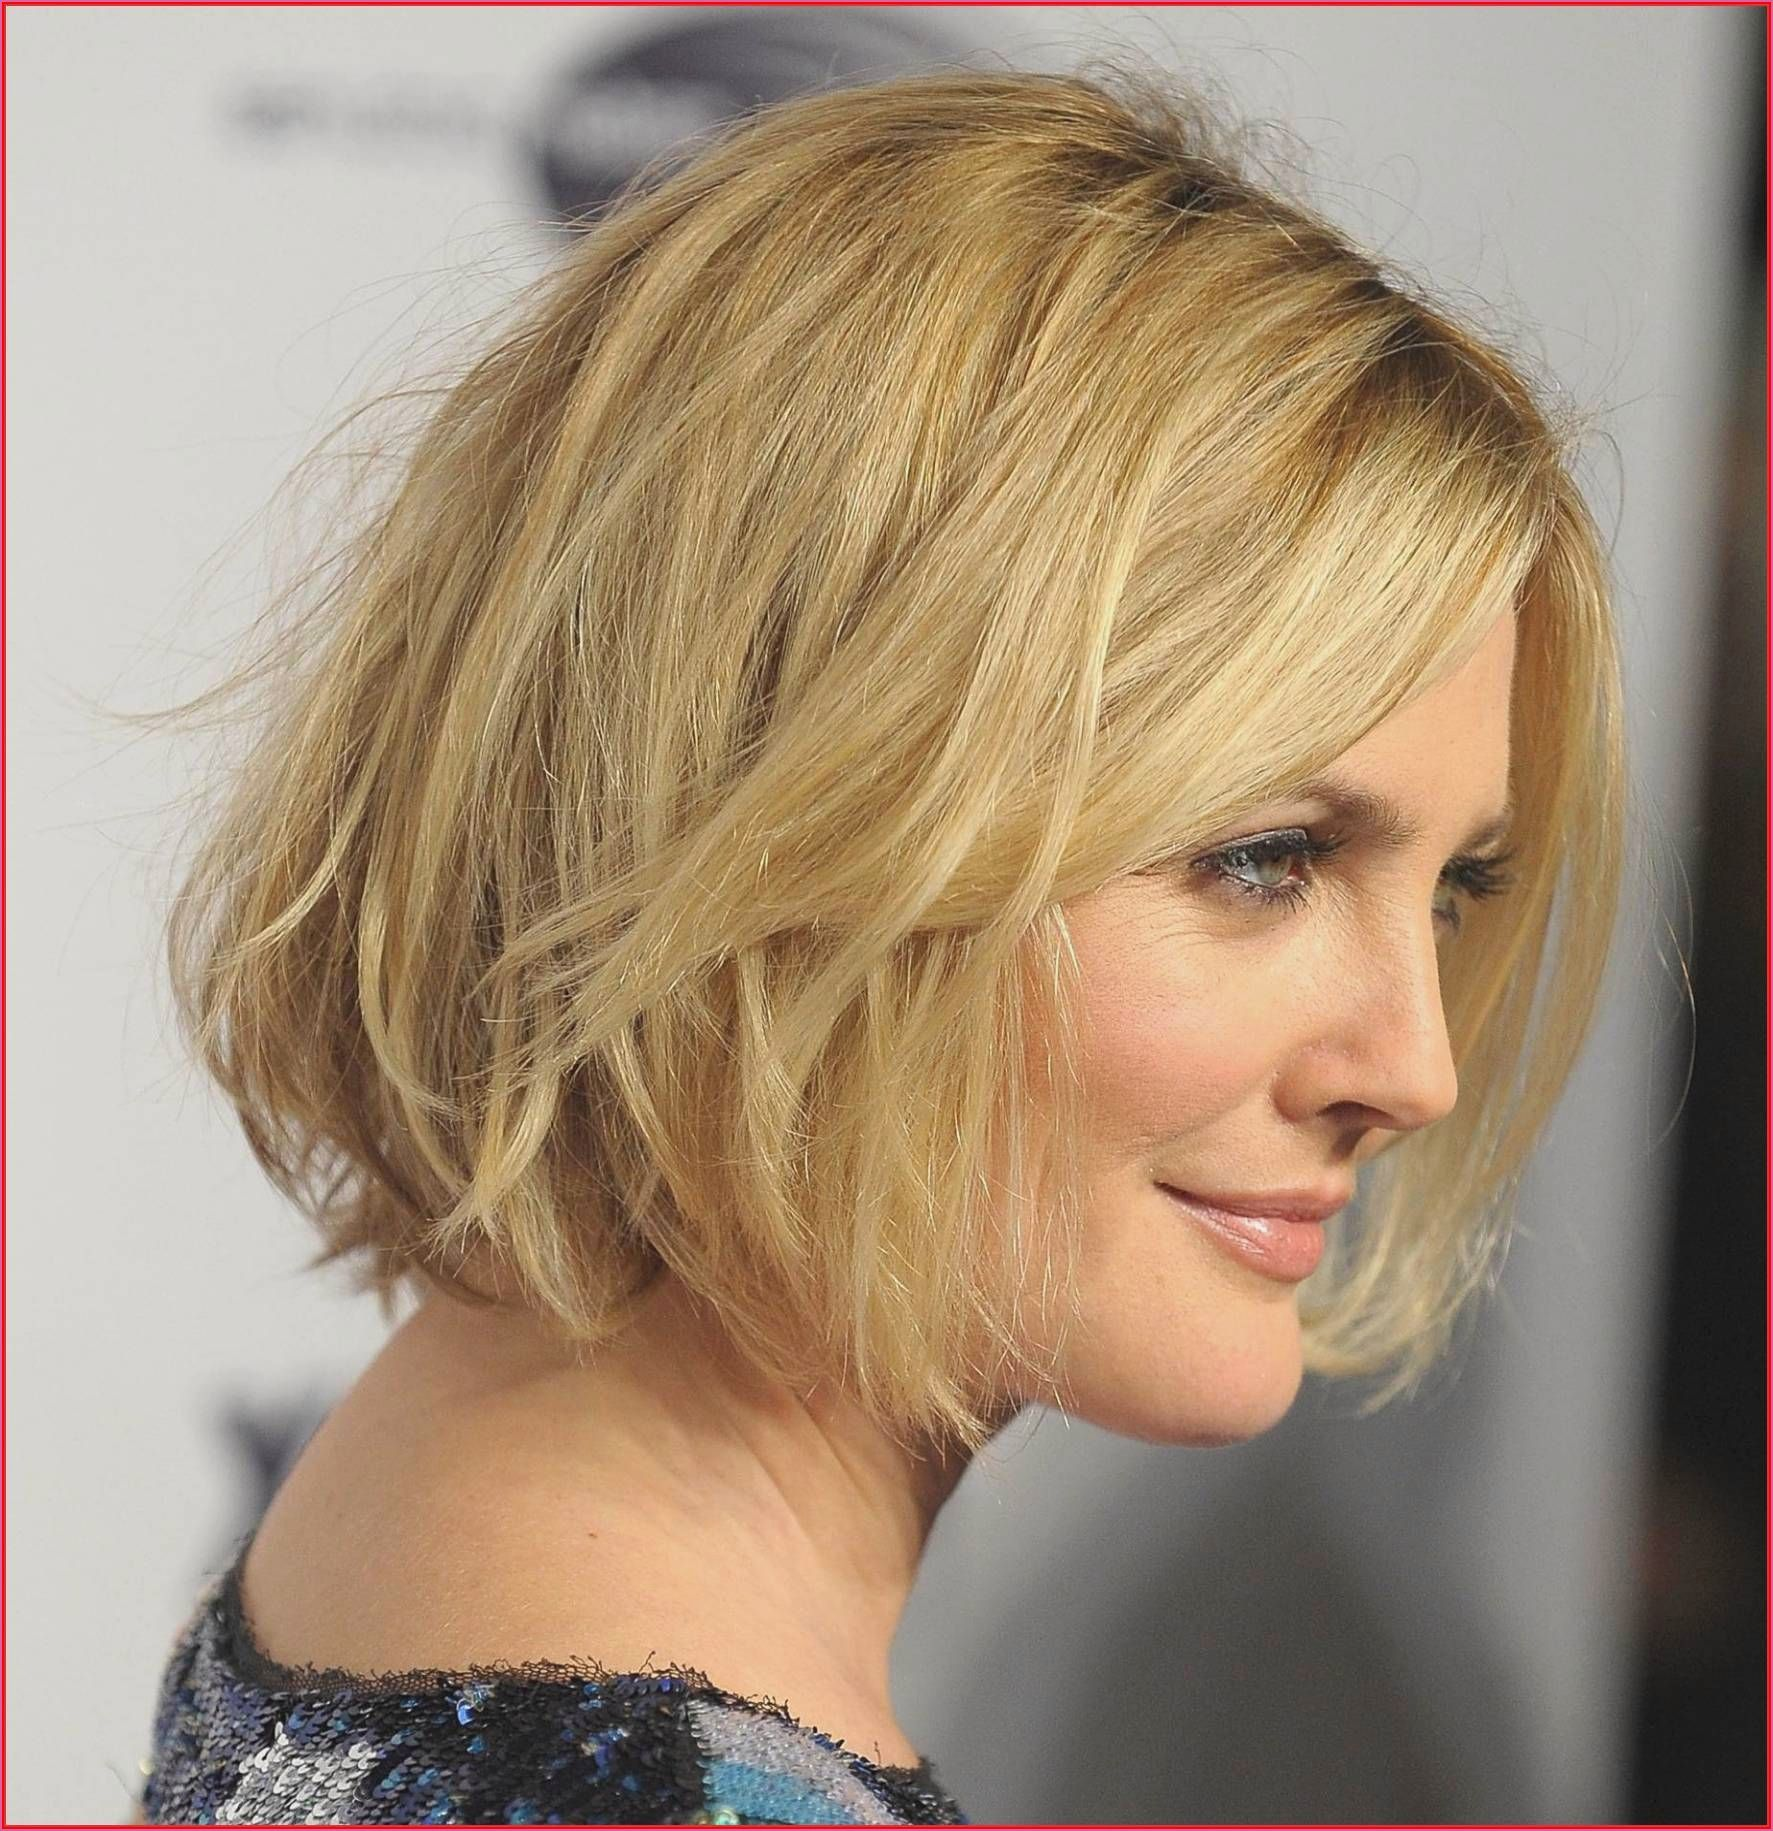 Genial Haircut Near Me Yelp In 2020 Curly Hair Styles Medium Hair Styles Thick Hair Styles